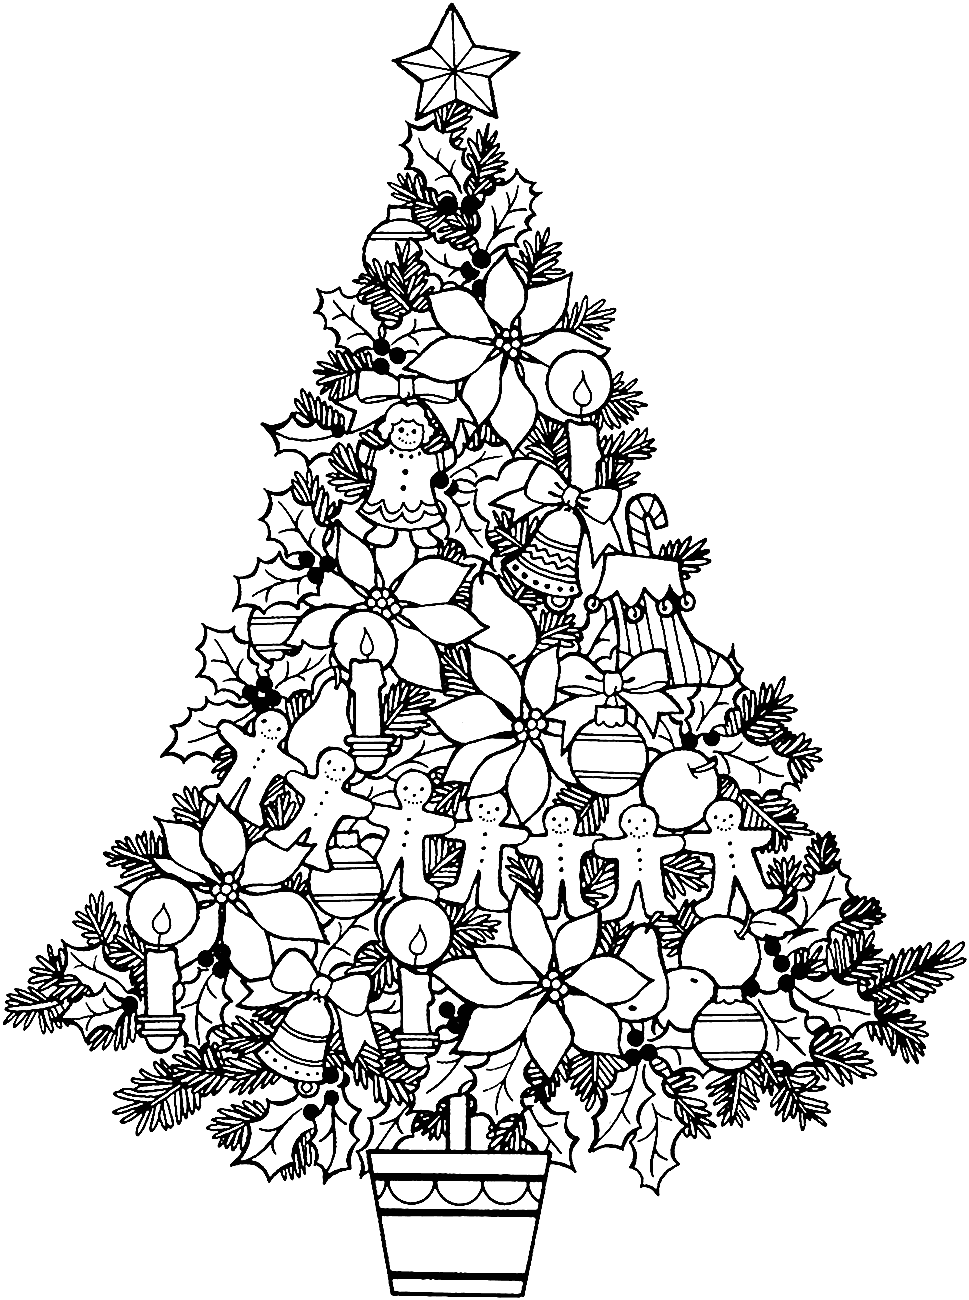 Черно белые картинки елок